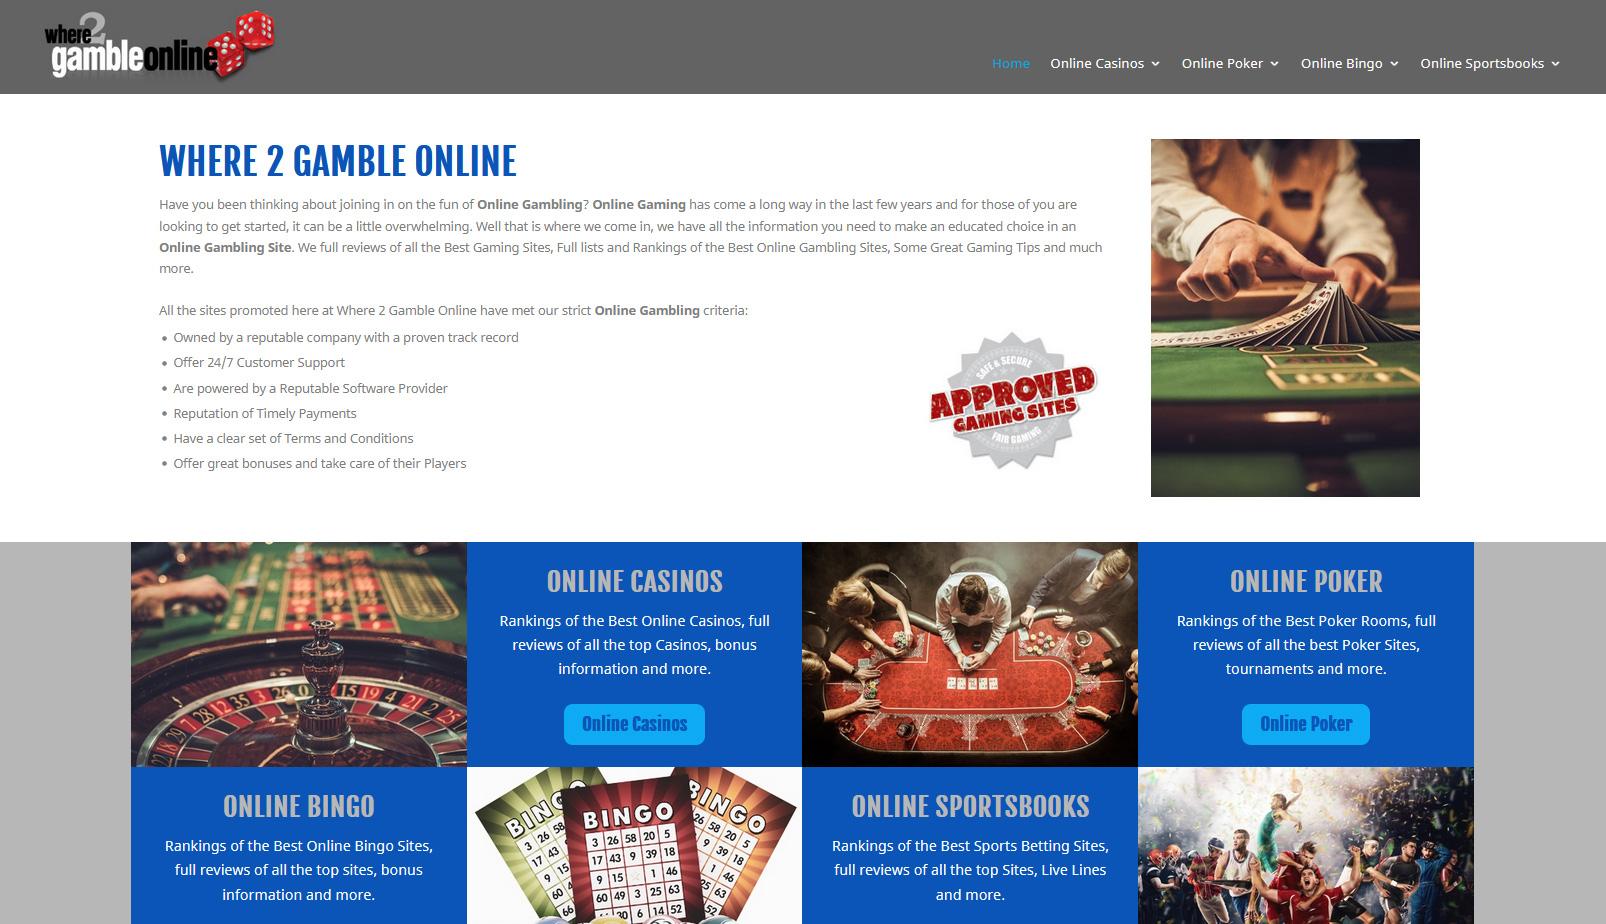 Where 2 Gamble Online